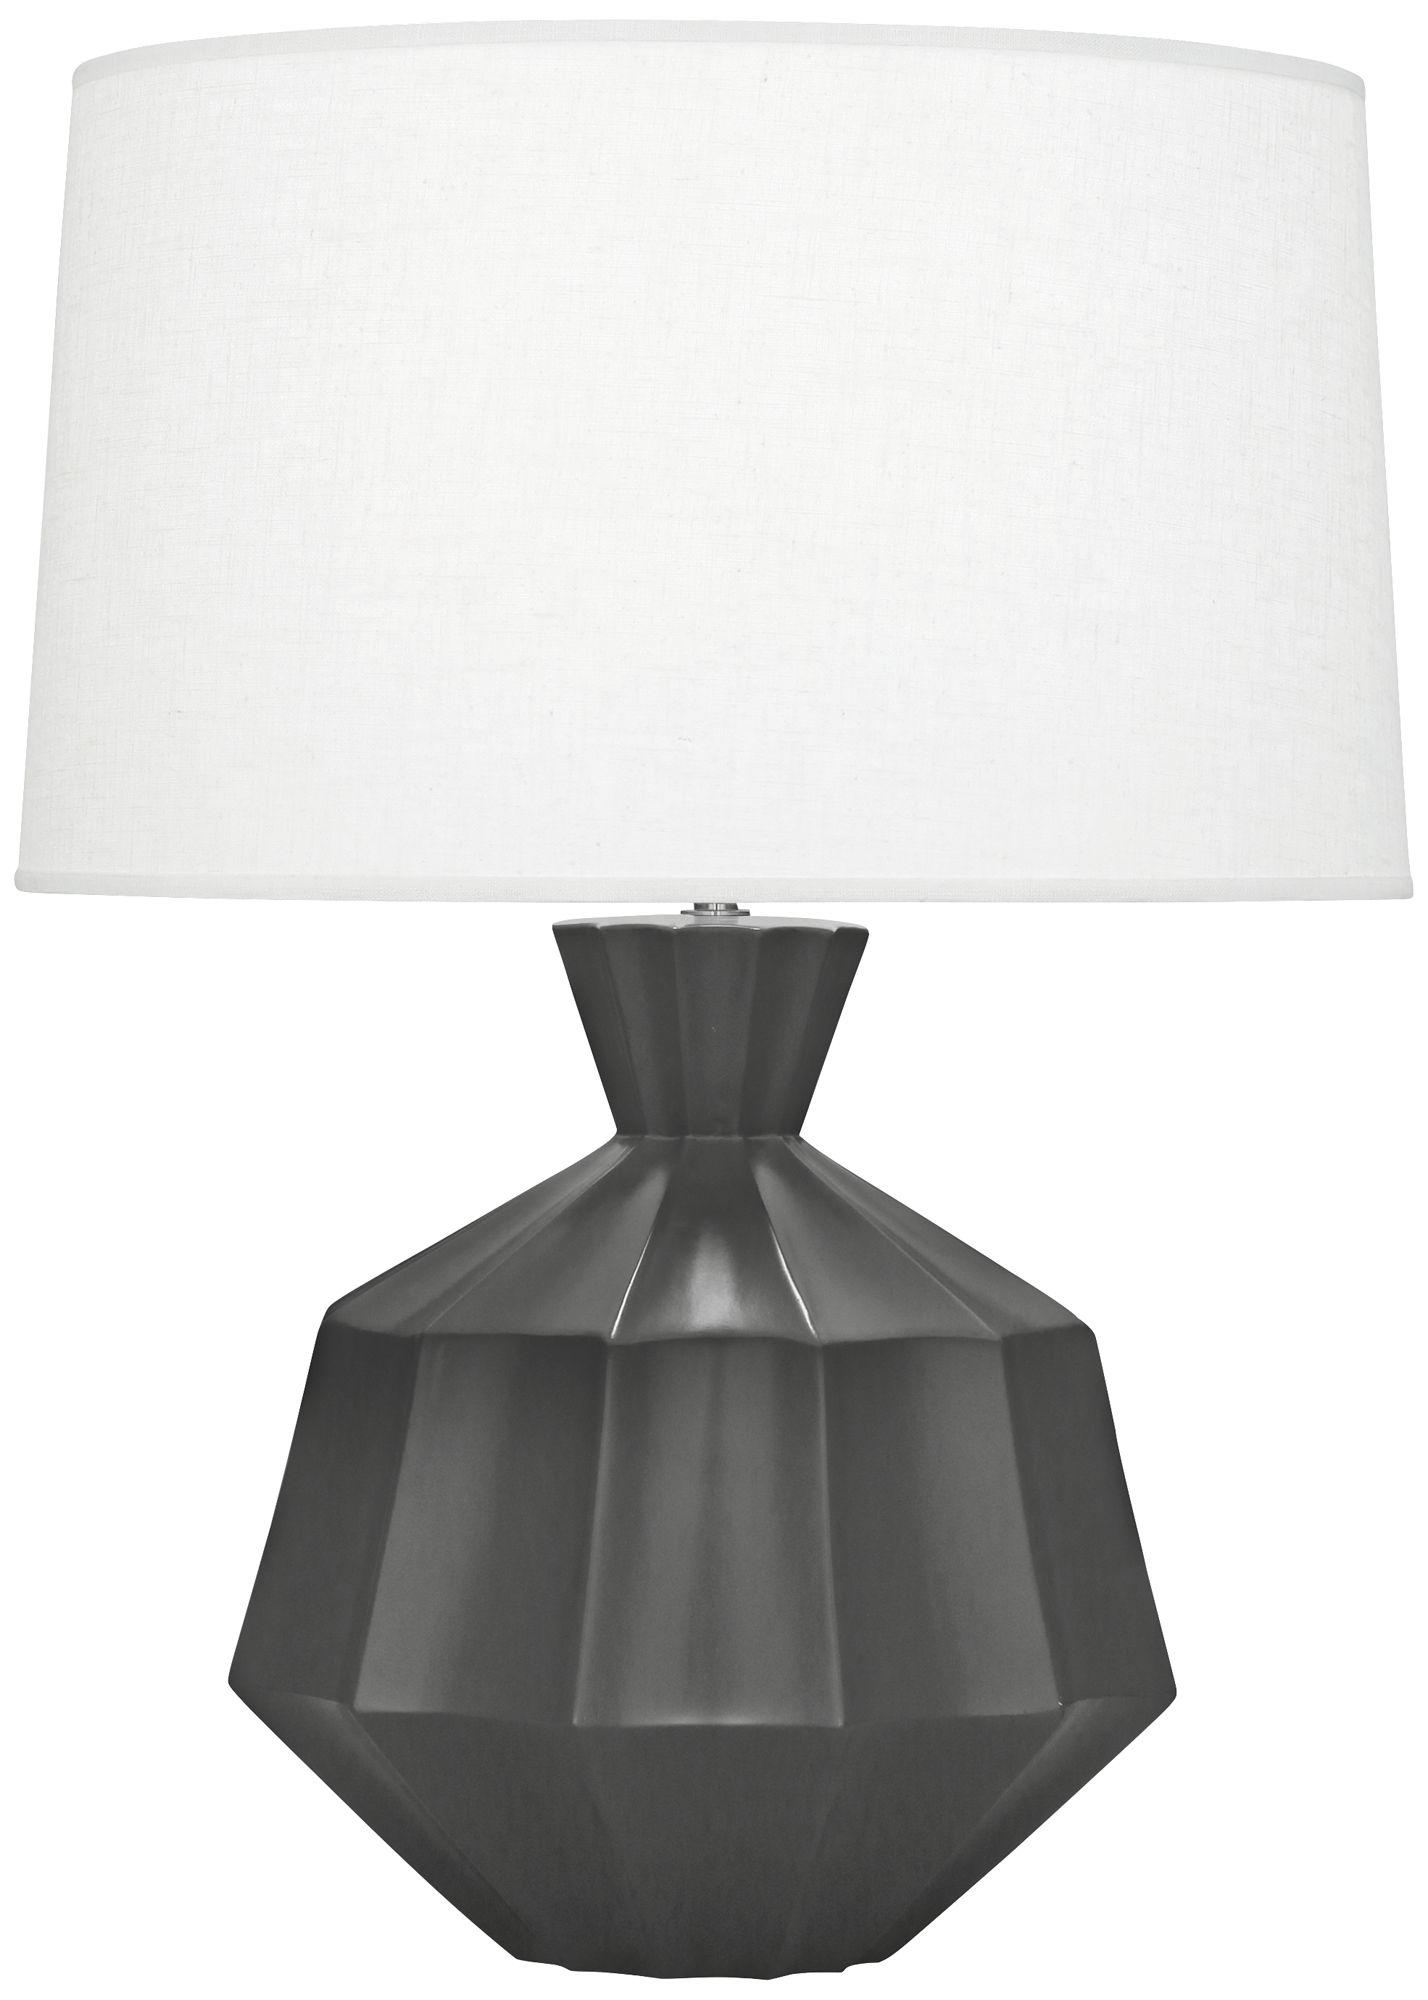 Delightful Robert Abbey Orion Matte Ash Black Ceramic Table Lamp